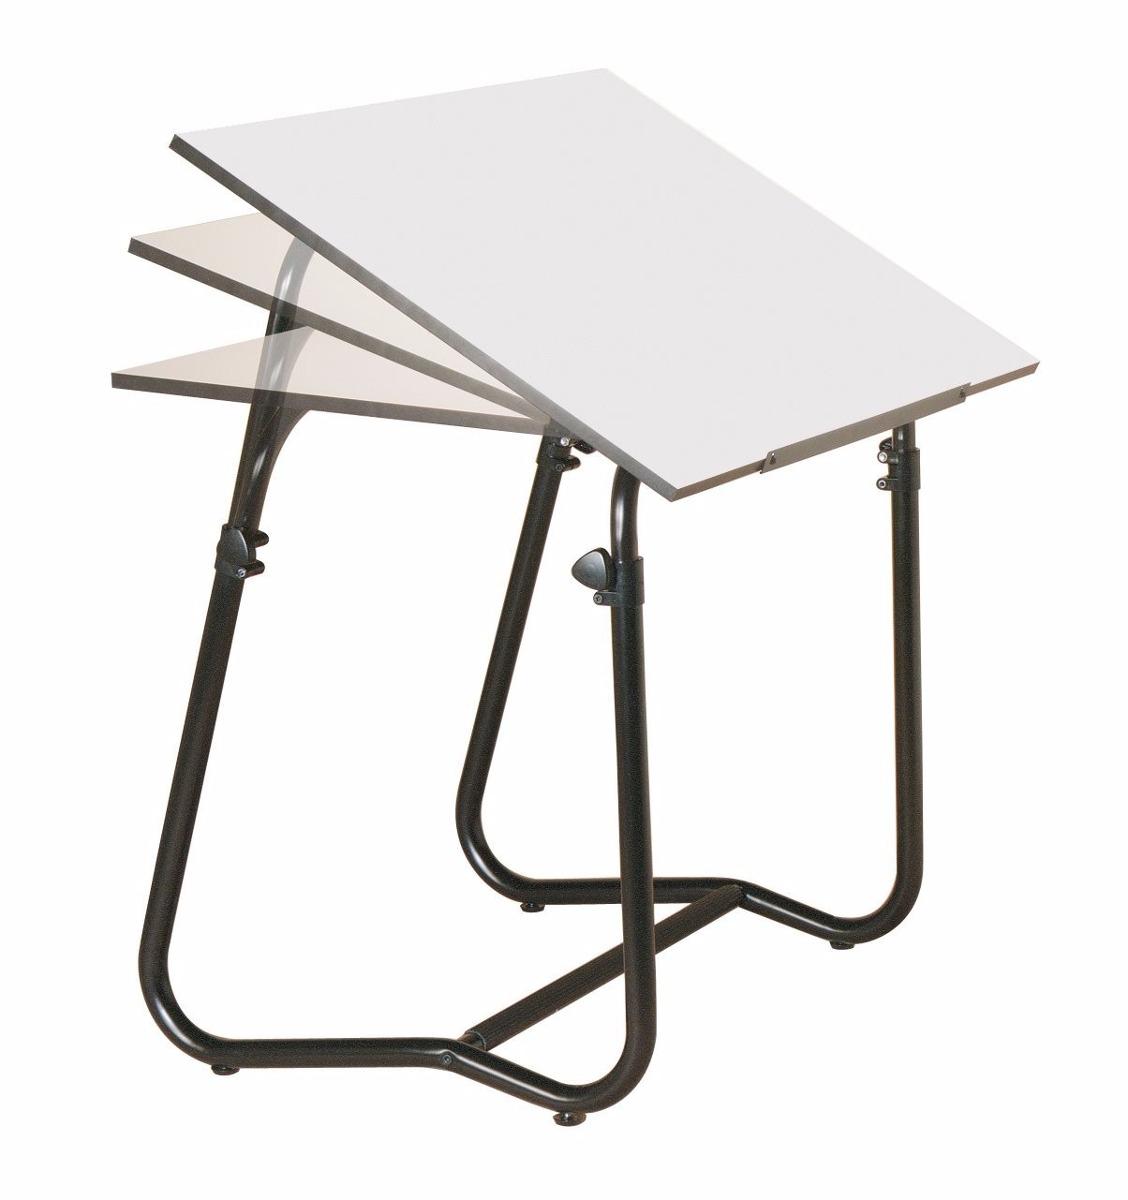 Escritorio mesa de trabajo restirador doble vista blanco - Escritorio mesa de trabajo ...